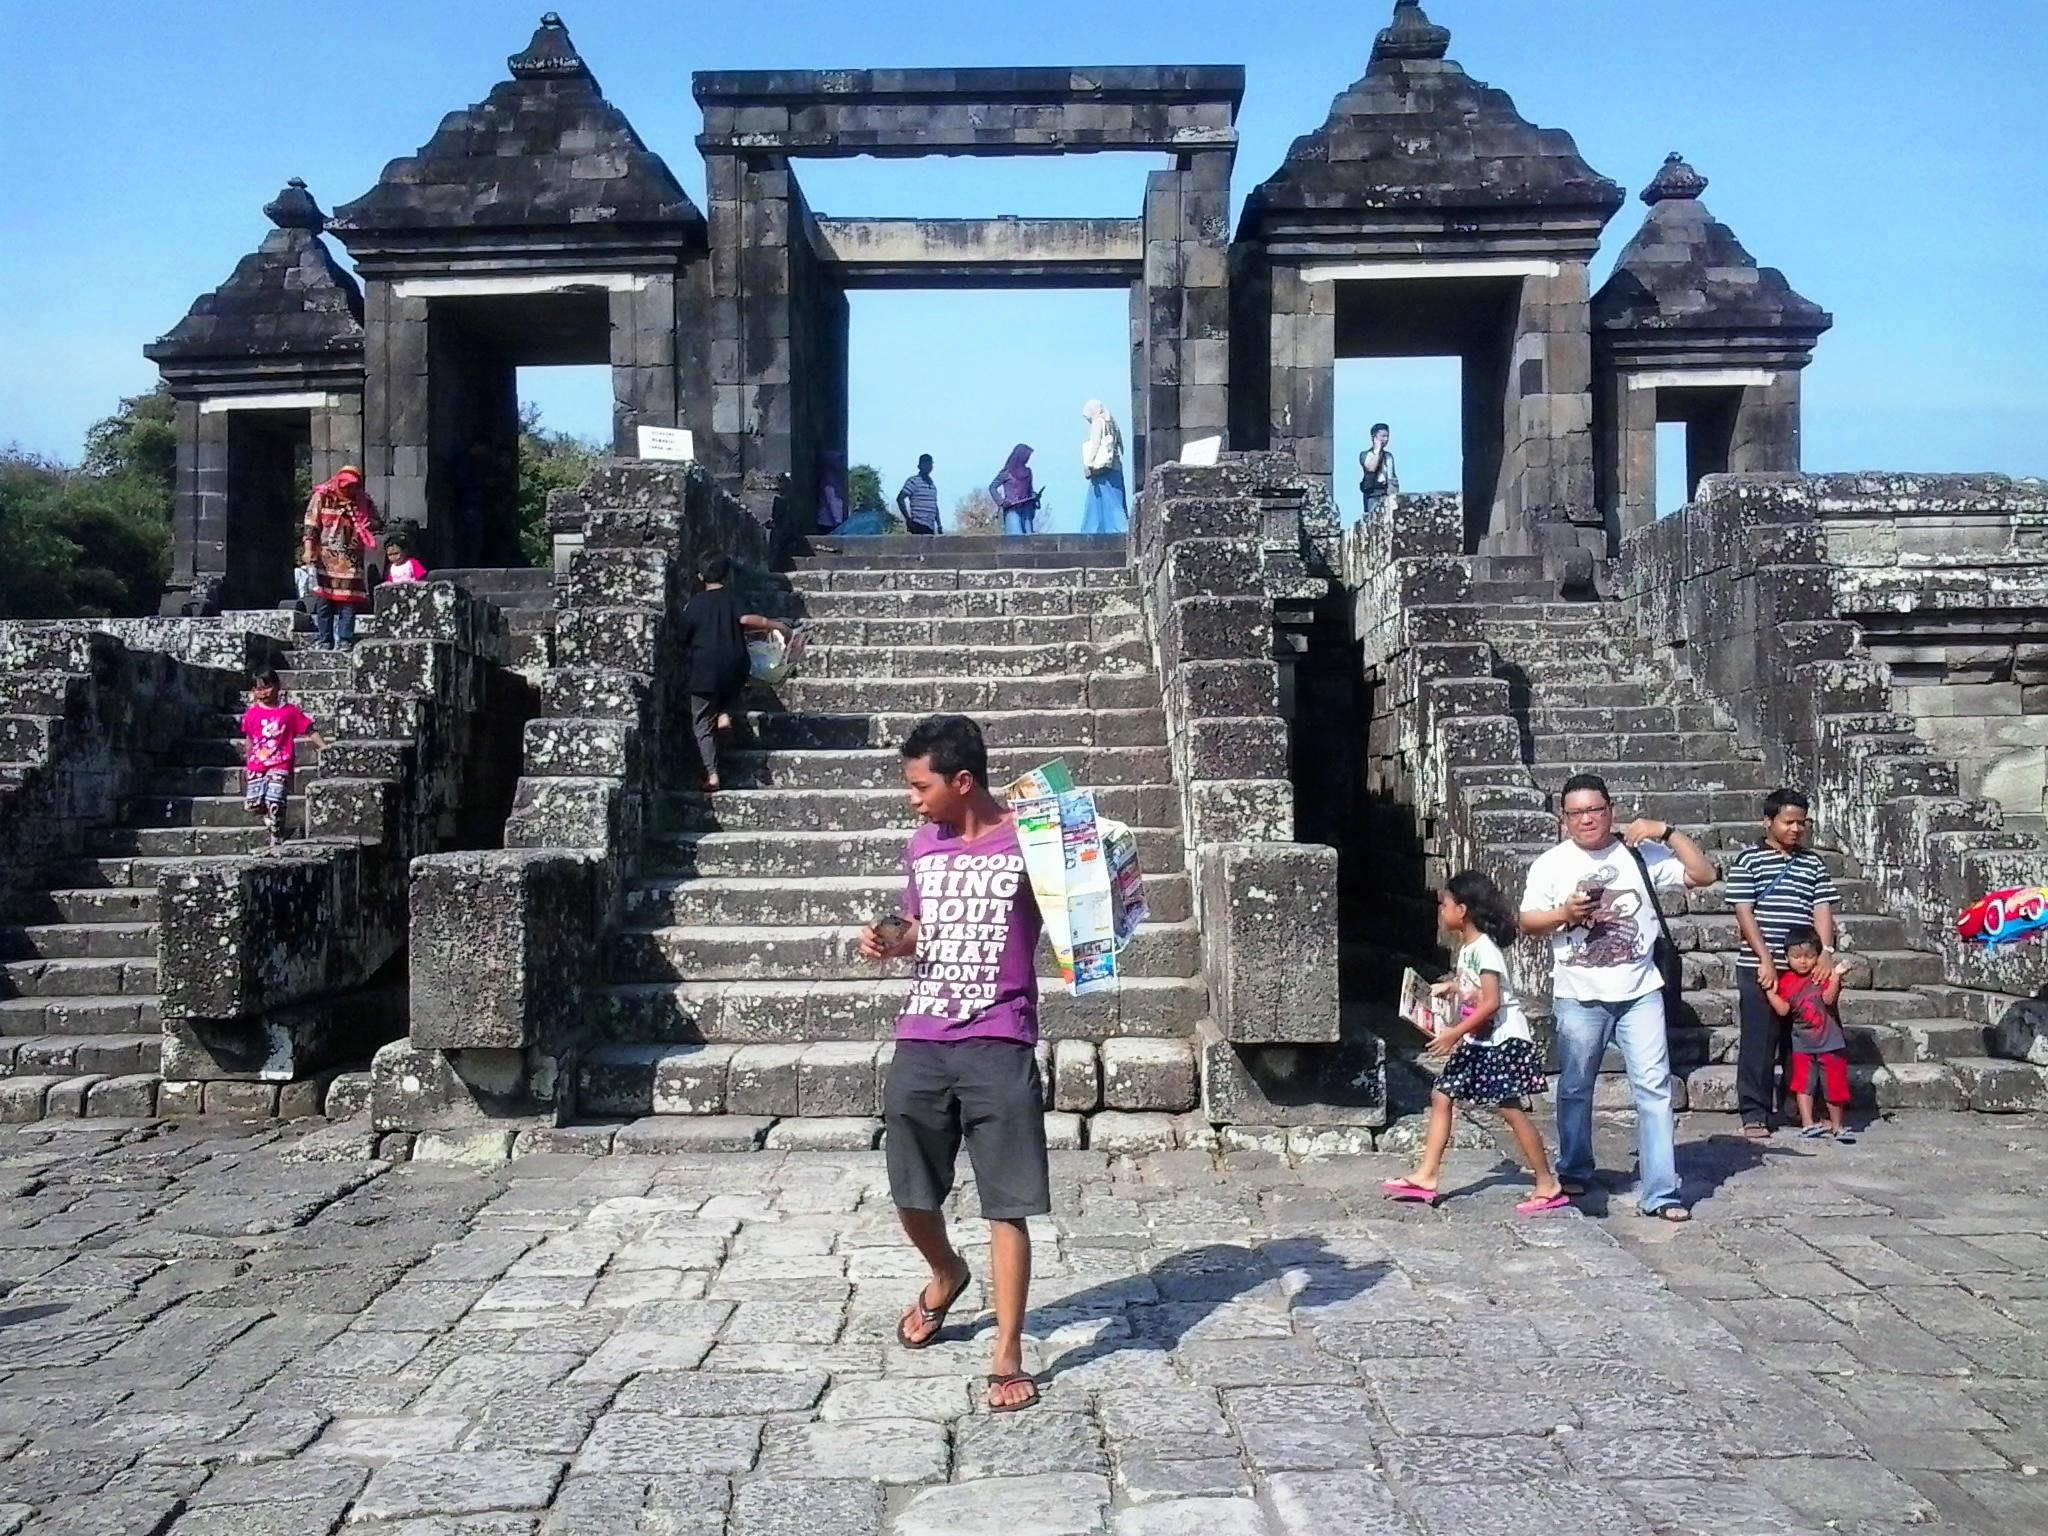 Situs Ratu Boko Bangunan Candi Istana Travel Today Bagian Tengah